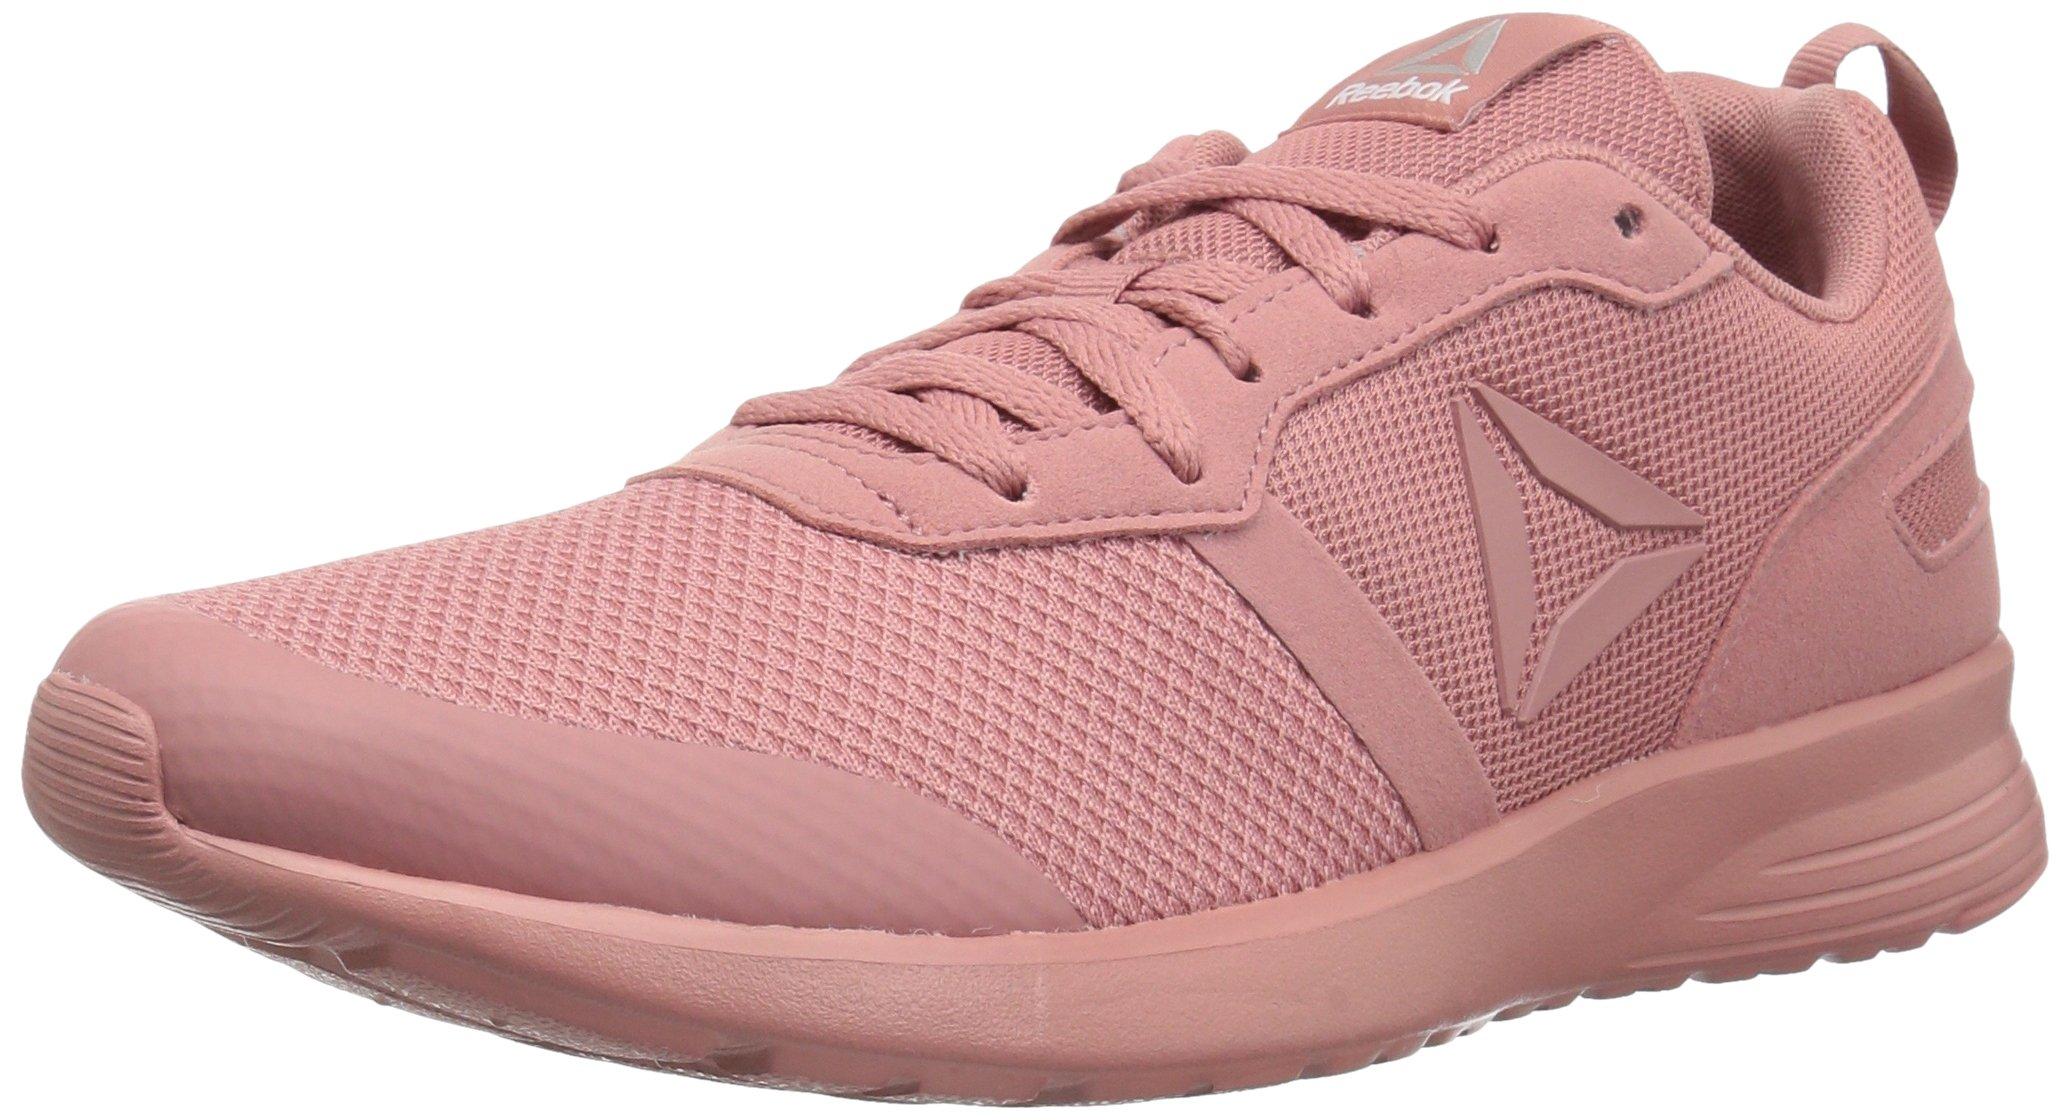 ad7a45cb5af9 Galleon - Reebok Women s Foster Flyer Track Shoe